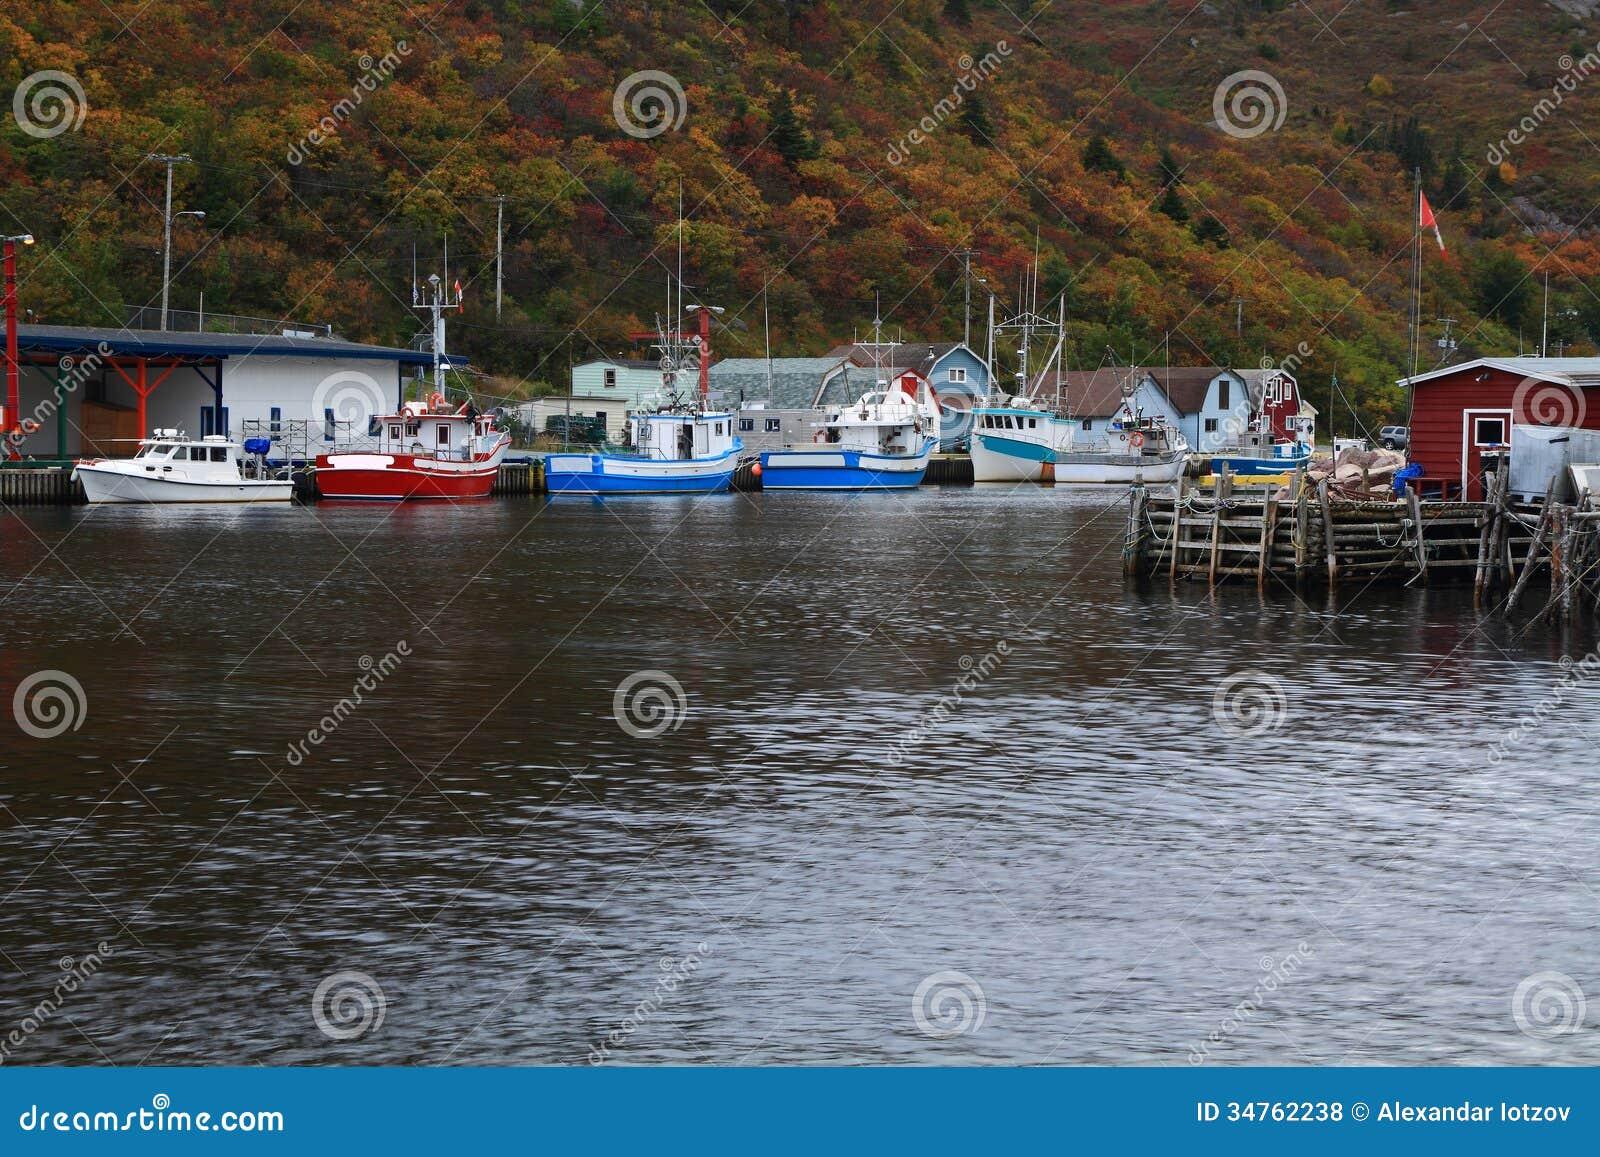 Pier For Fishing Boats (ships) Petty Harbor, Newfoundland, Canada Stock Photo - Image: 34762238